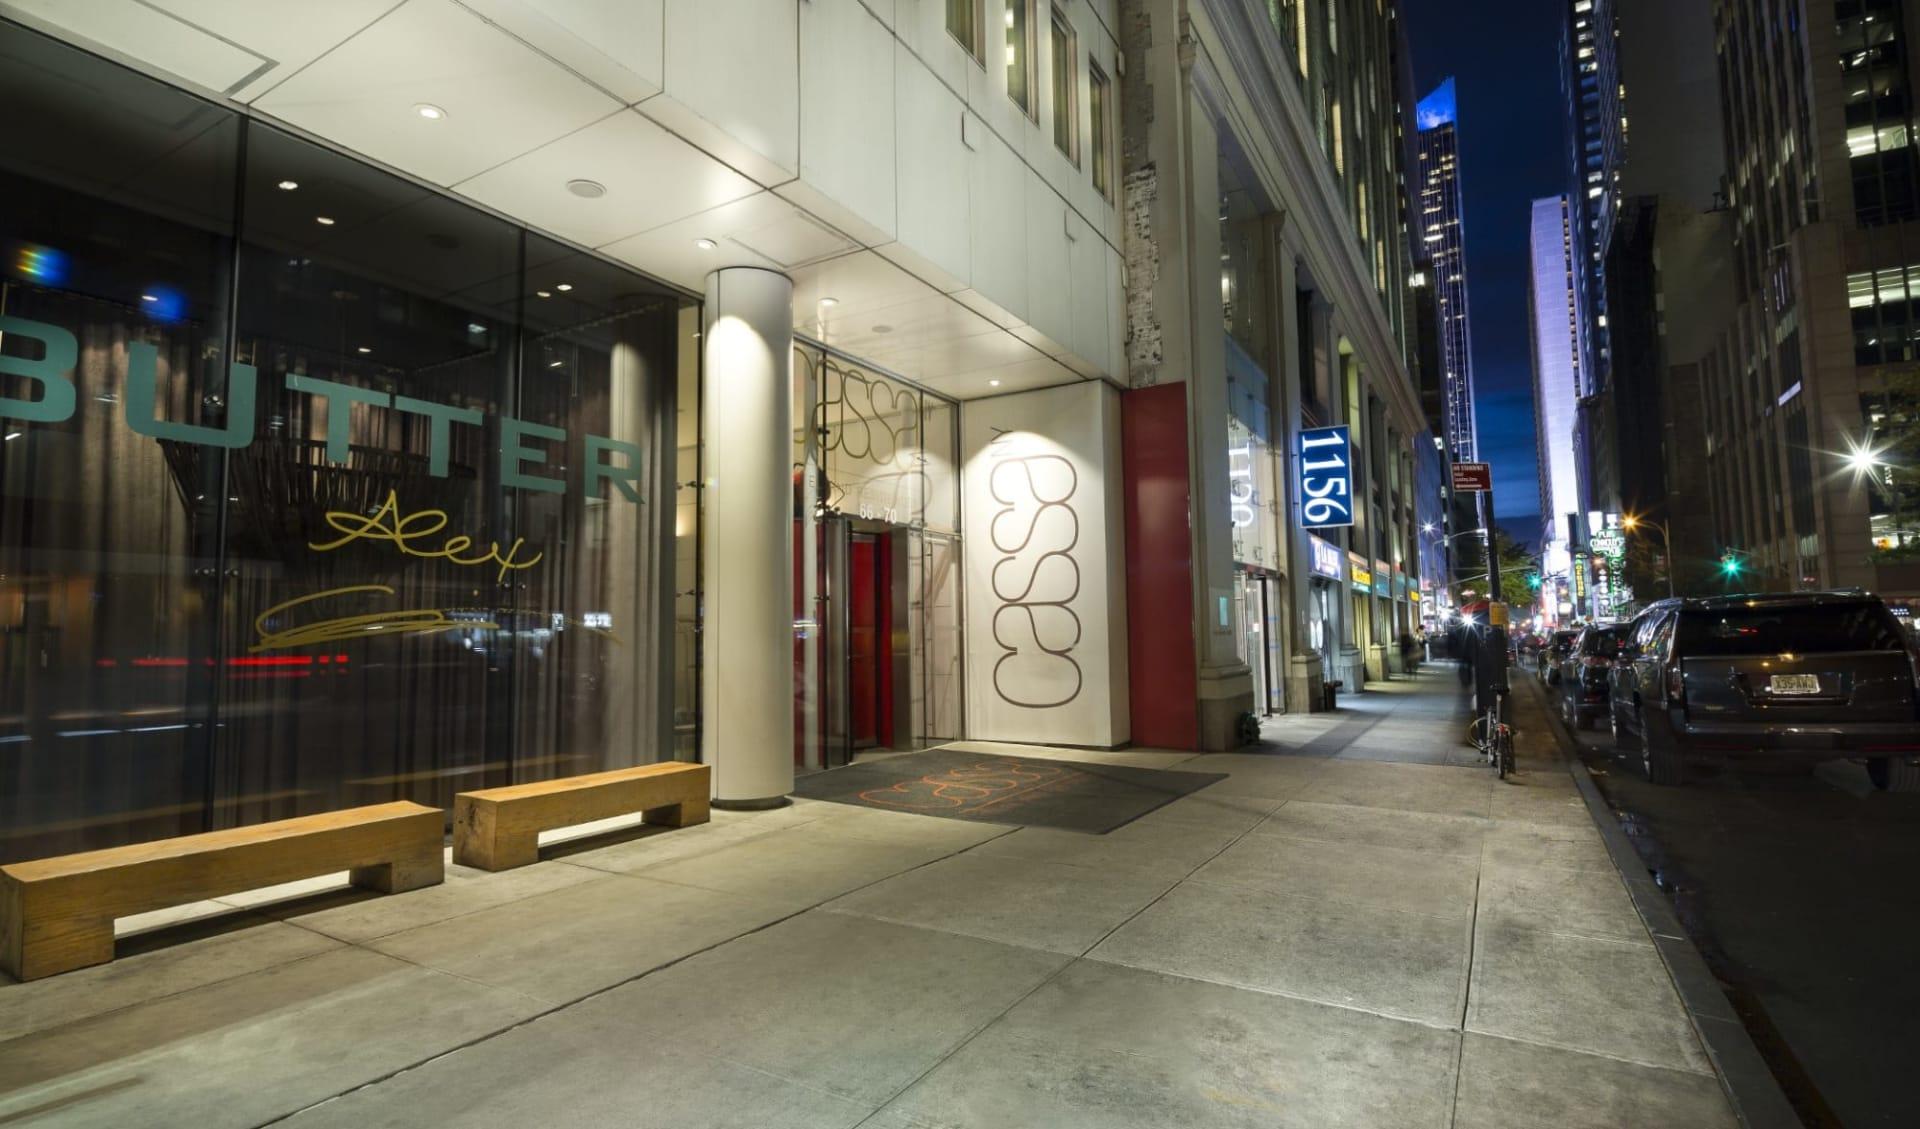 Cassa Hotel NY 45th Street in New York - Manhattan:  Cassa Hotel - Eingang